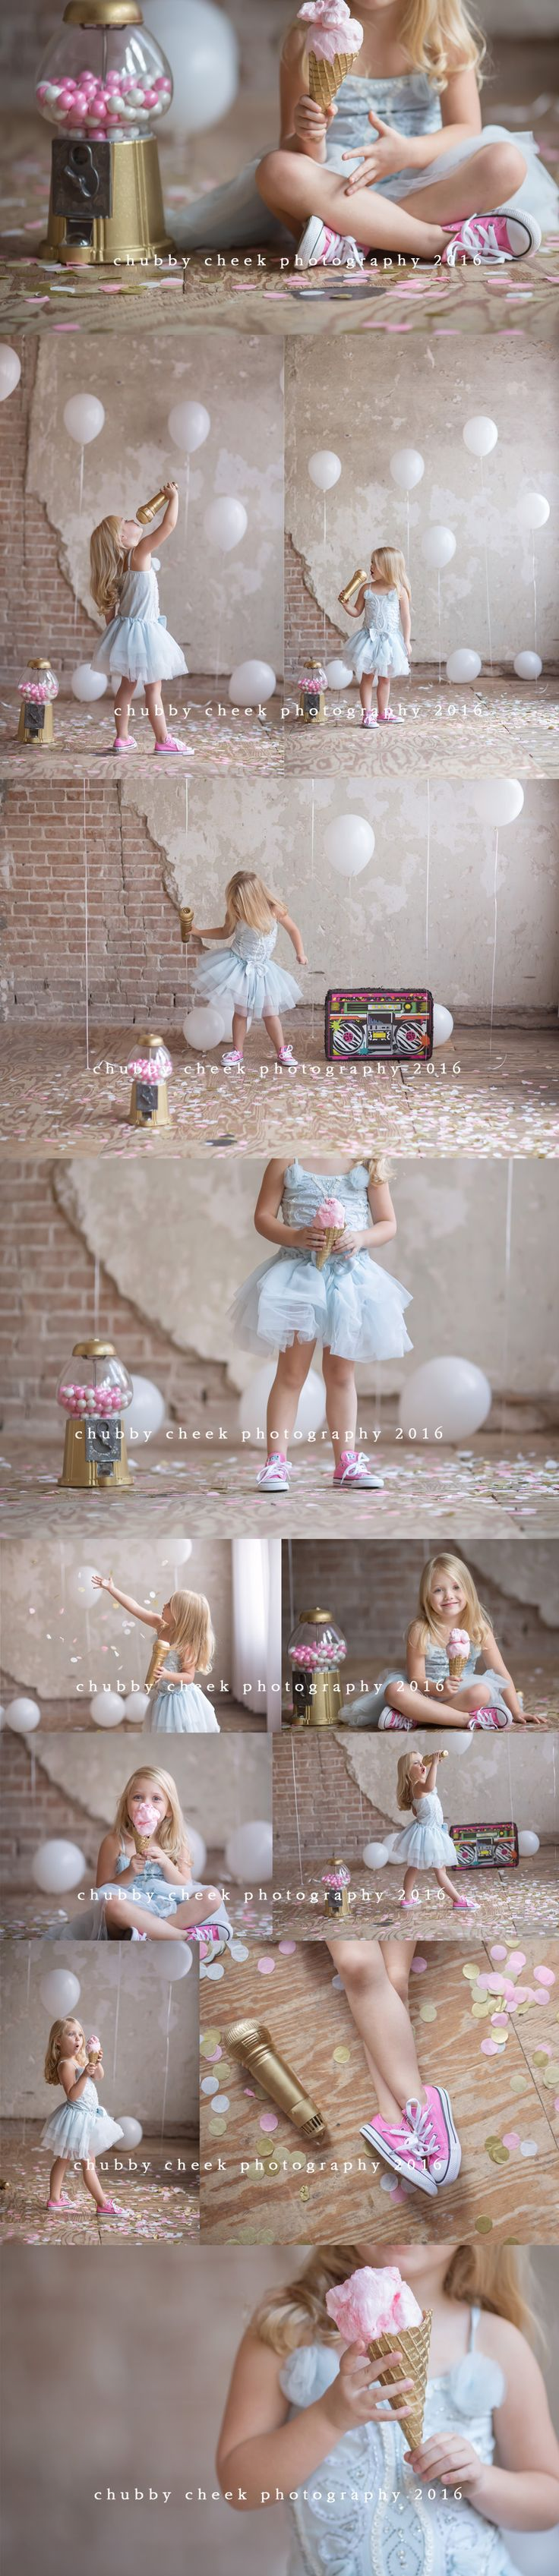 Pretty photos of a little girl with fun props: tutu, ice cream and bubblegum